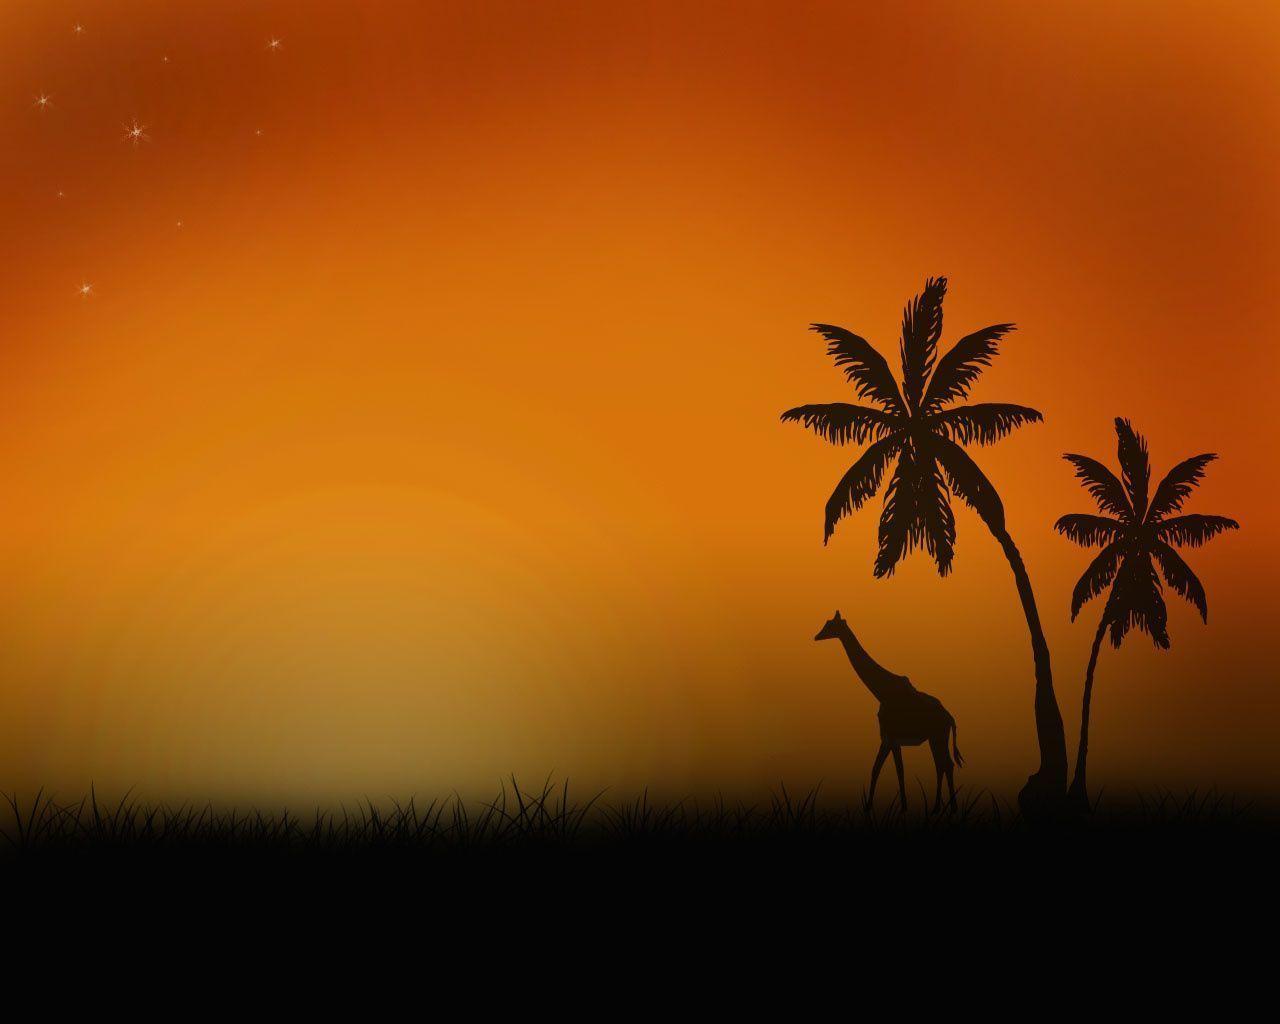 safari wallpaper – 1280×1024 High Definition Wallpaper, Background ...